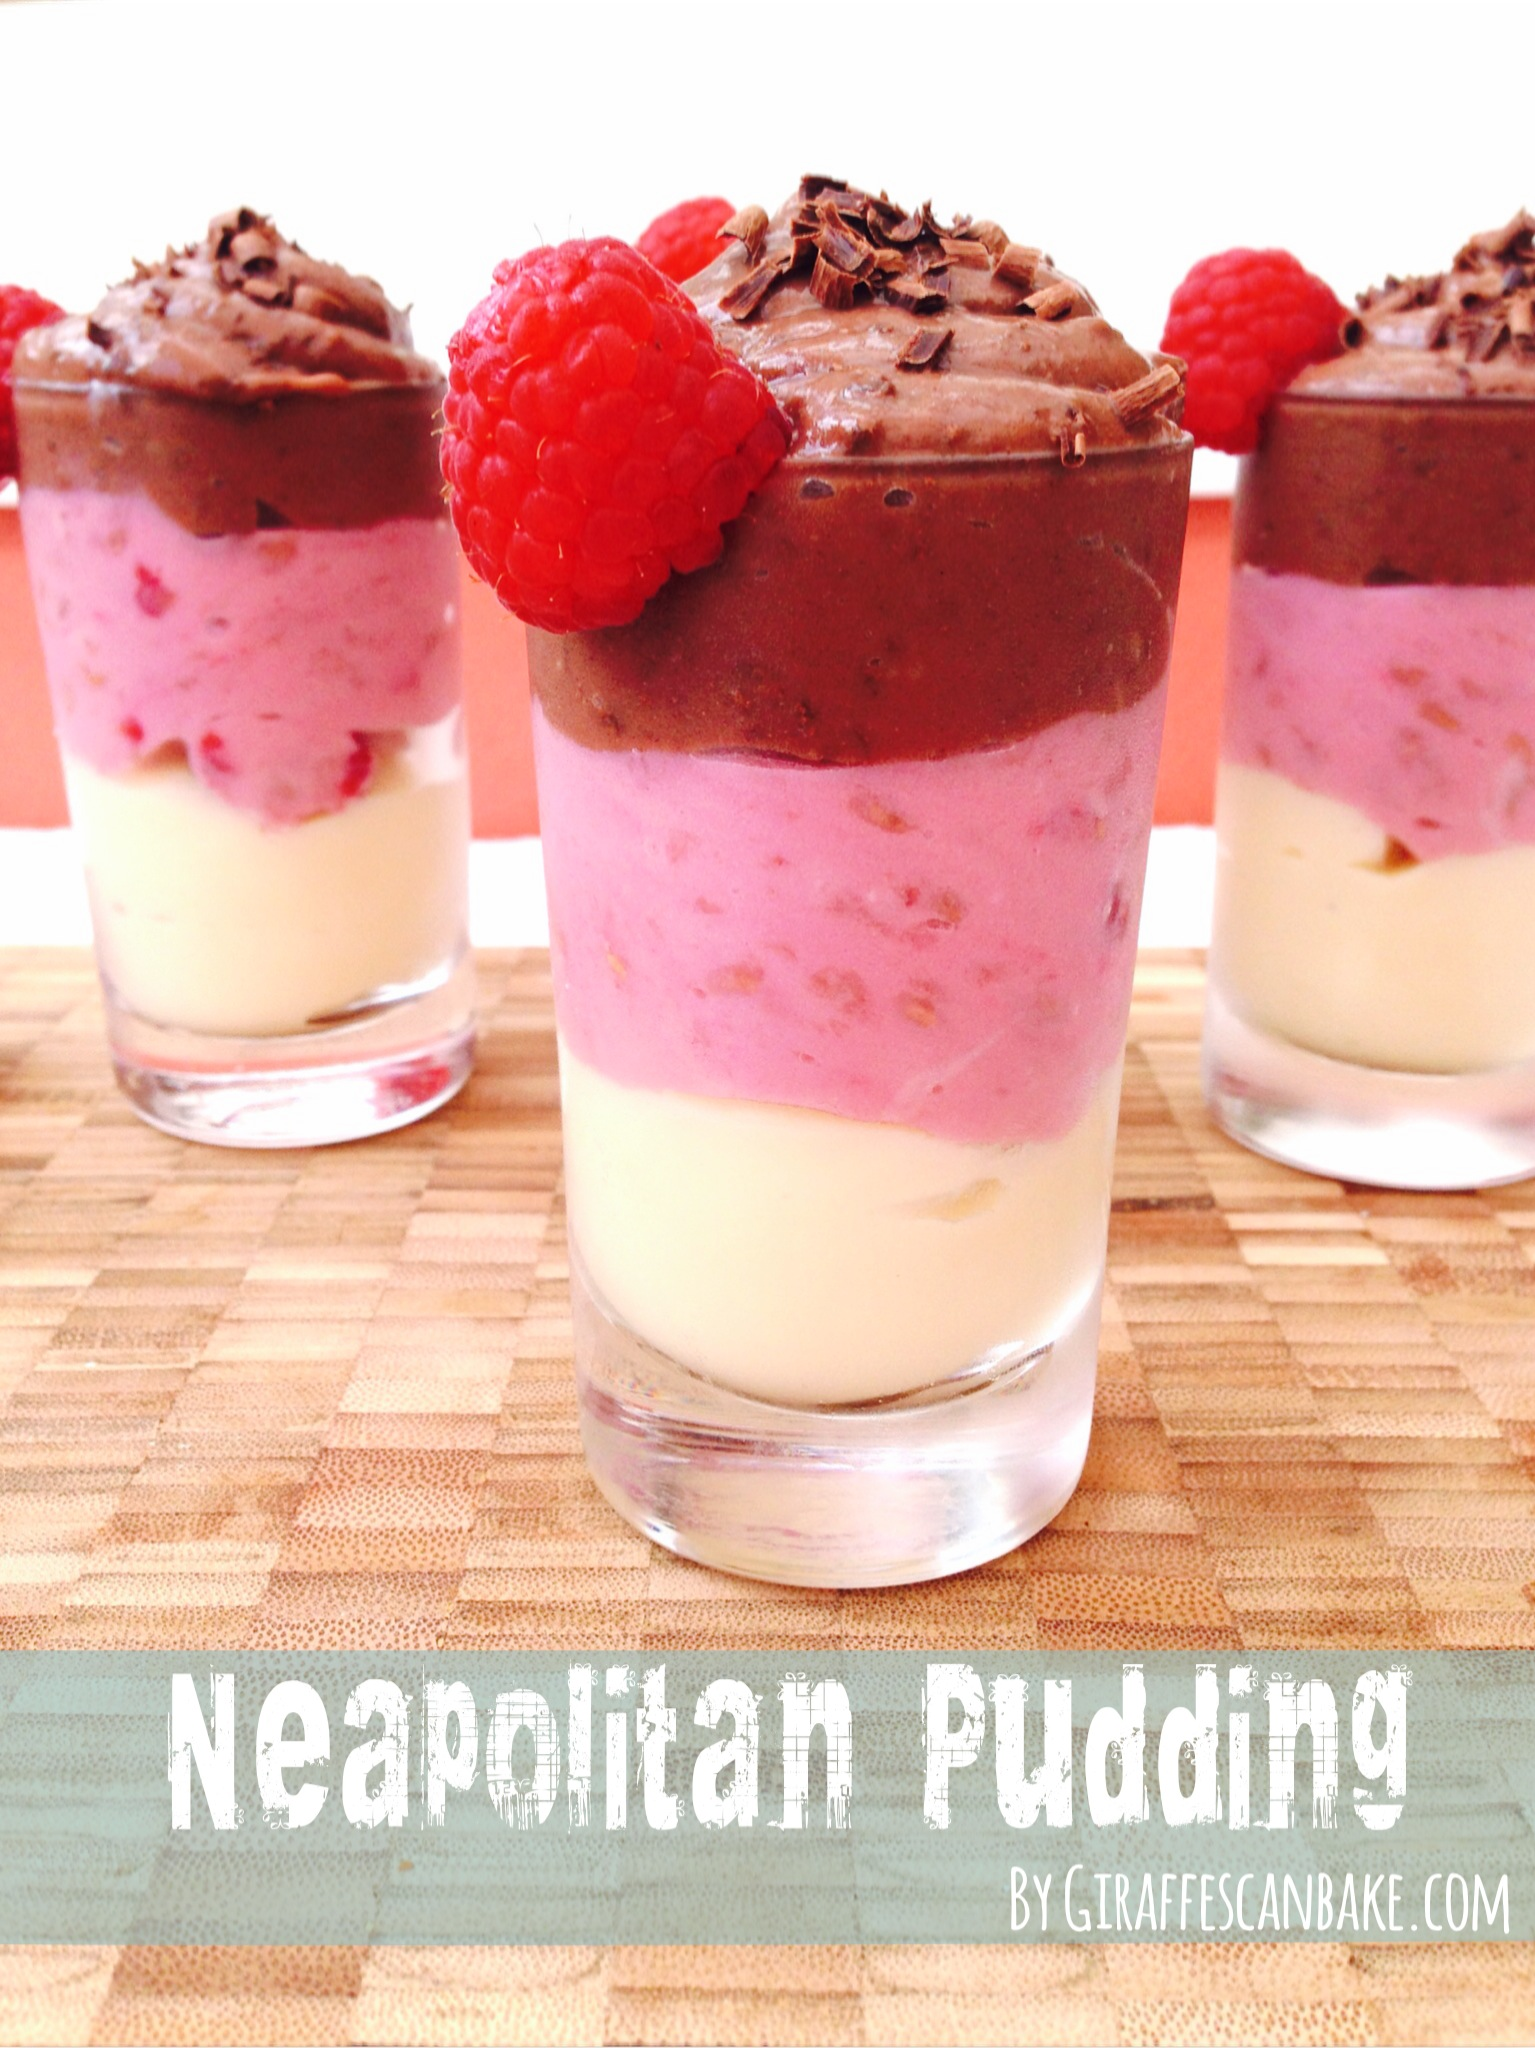 Neapolitan Pudding